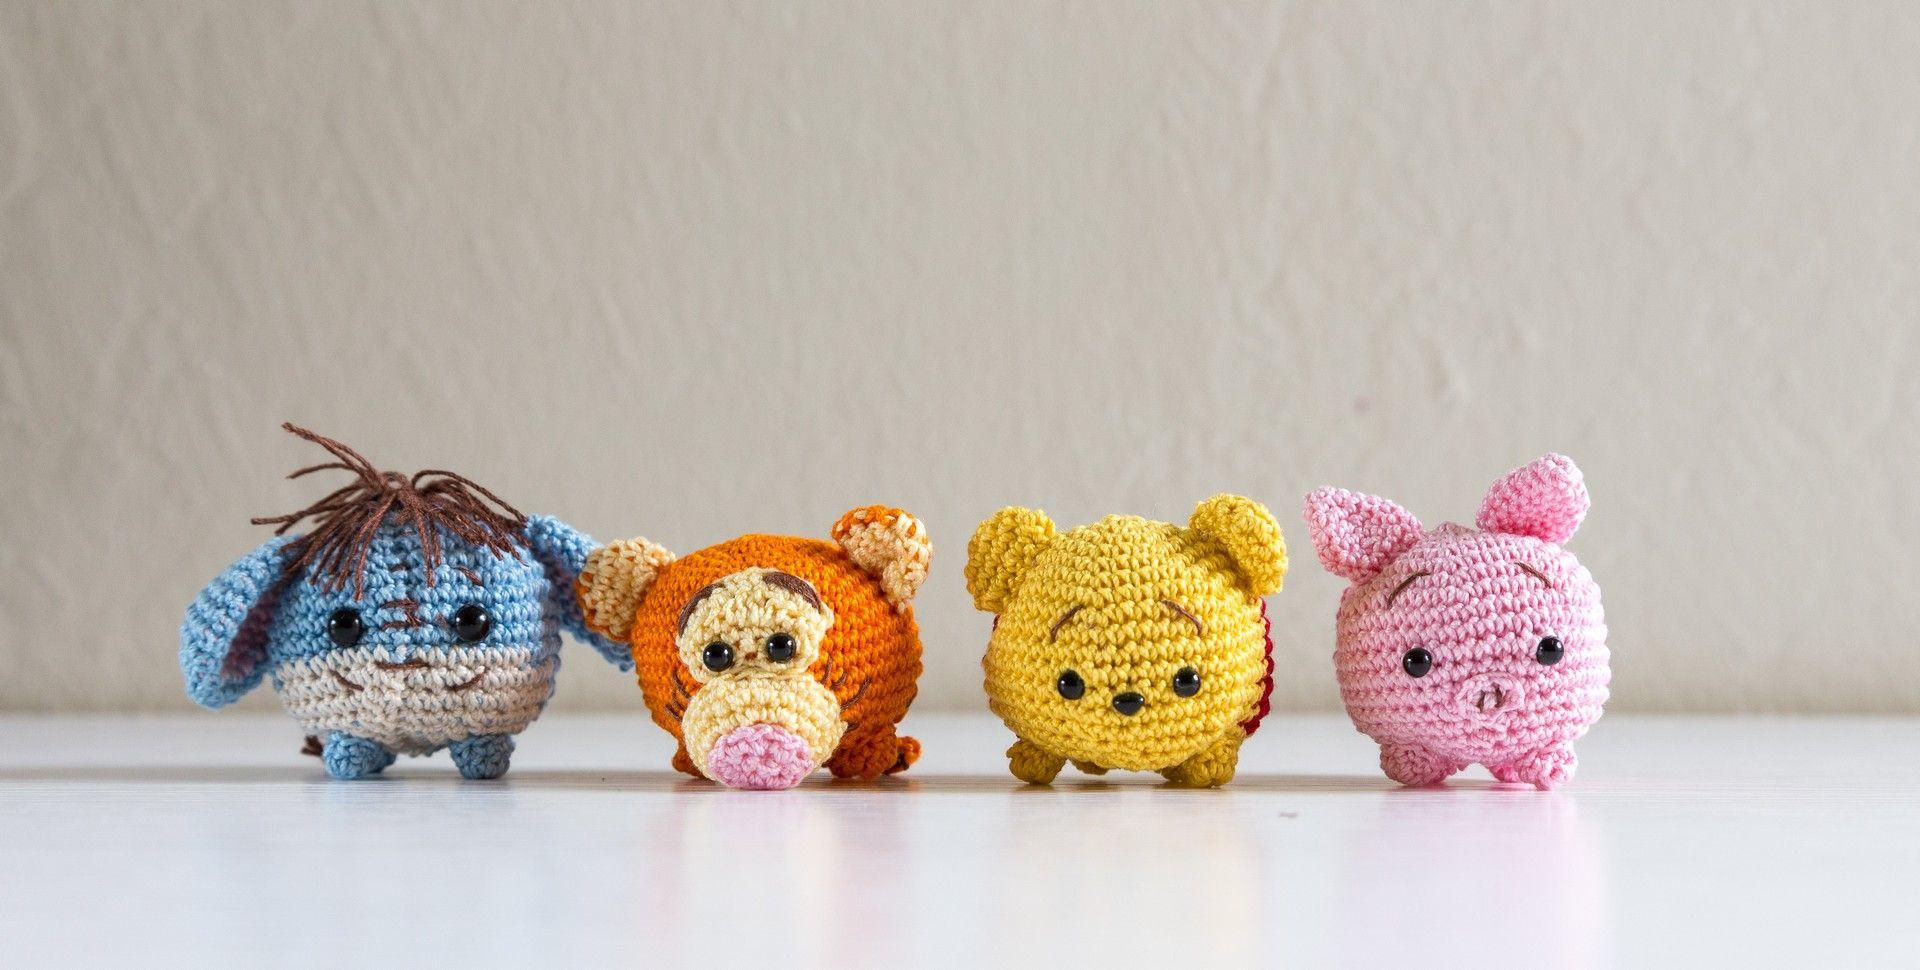 Tsum Tsum Amigurumi Pattern Free : Eeyore tigger pooh bear and piglet tsum tsum crochet amigurumi